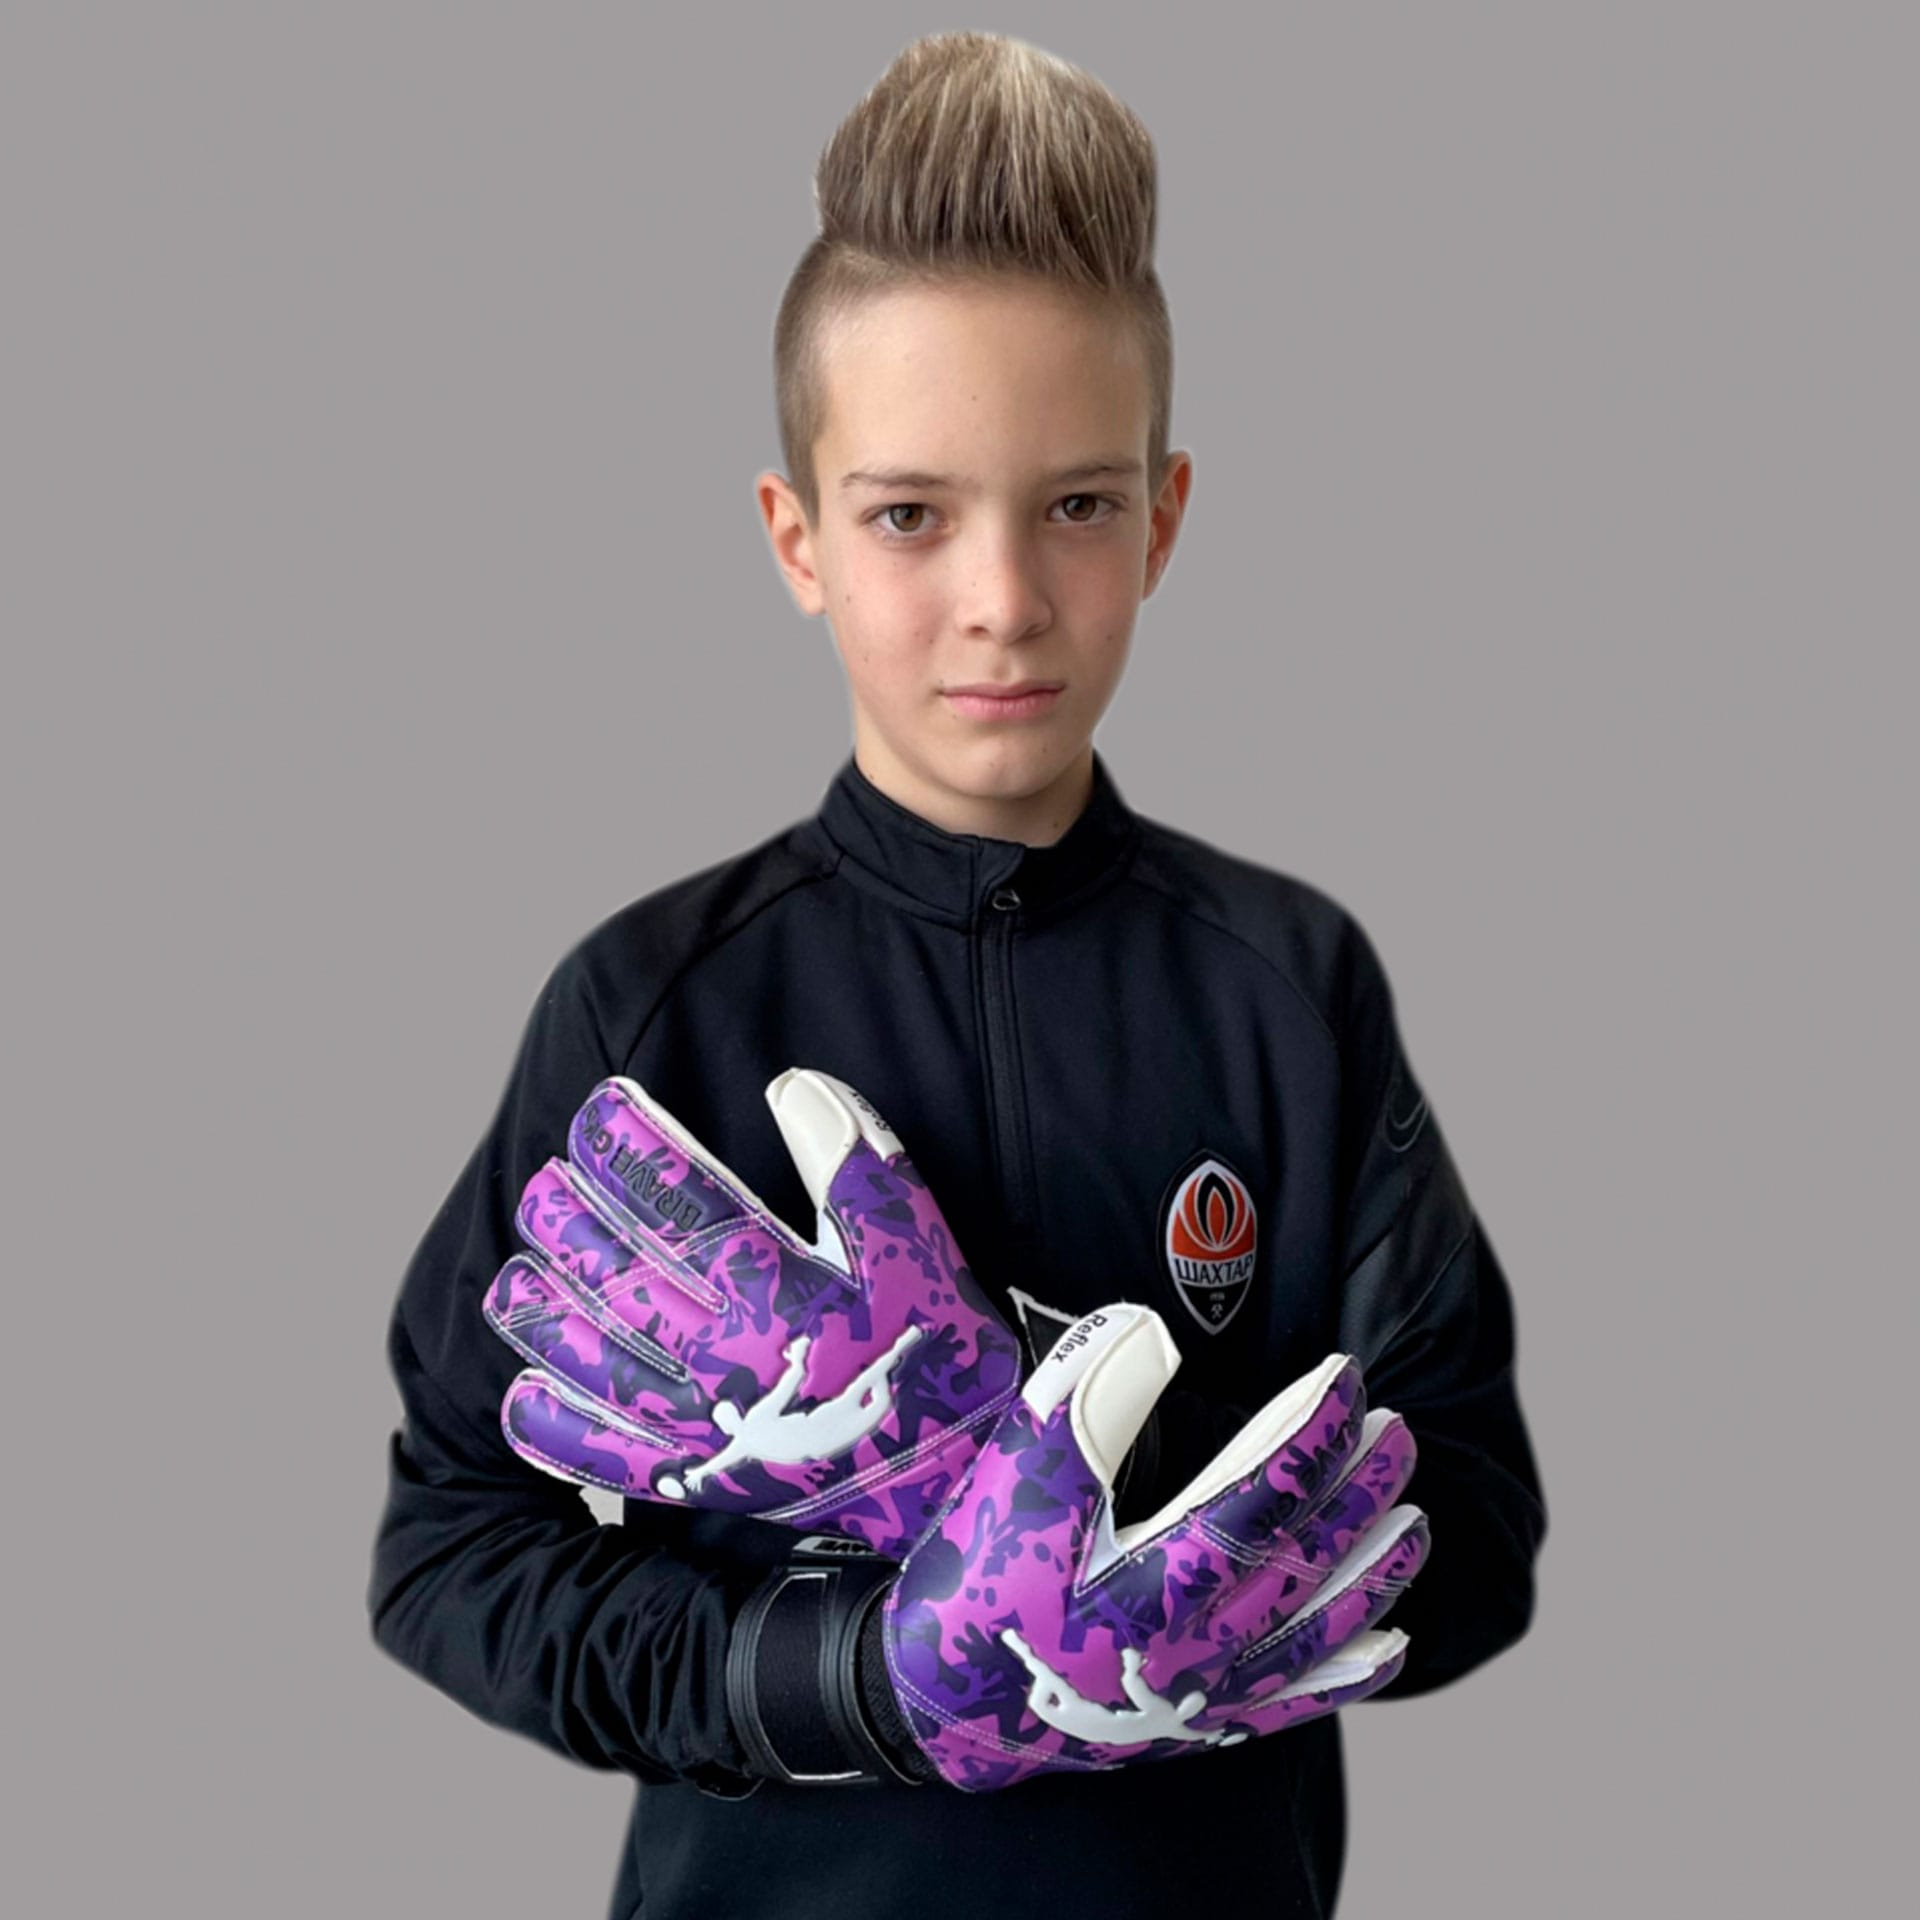 Рукавиці Brave GK Reflex Camo Purple - інтернет-магазин Brave GK